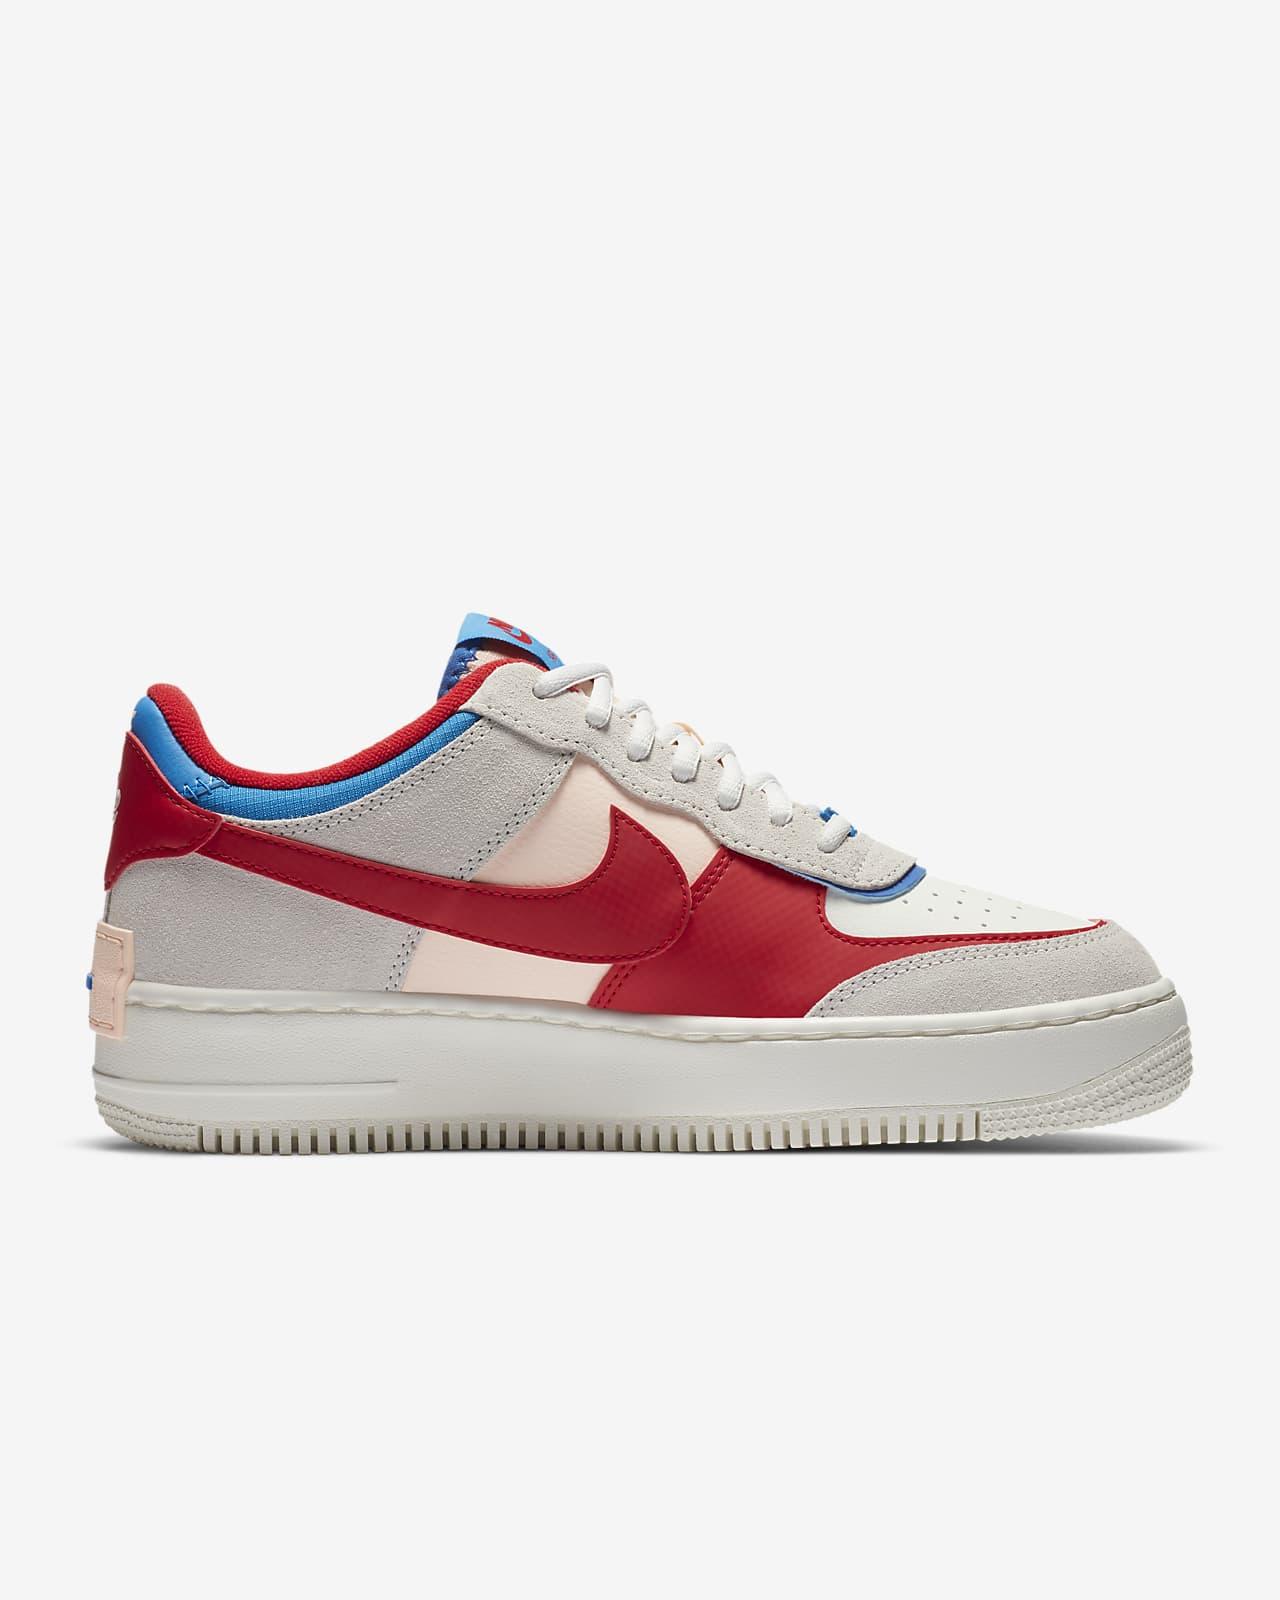 Nike Air Force 1 Shadow Women S Shoe Nike Id Кроссовки grateful dead bears x nike sb dunk low green. nike air force 1 shadow women s shoe